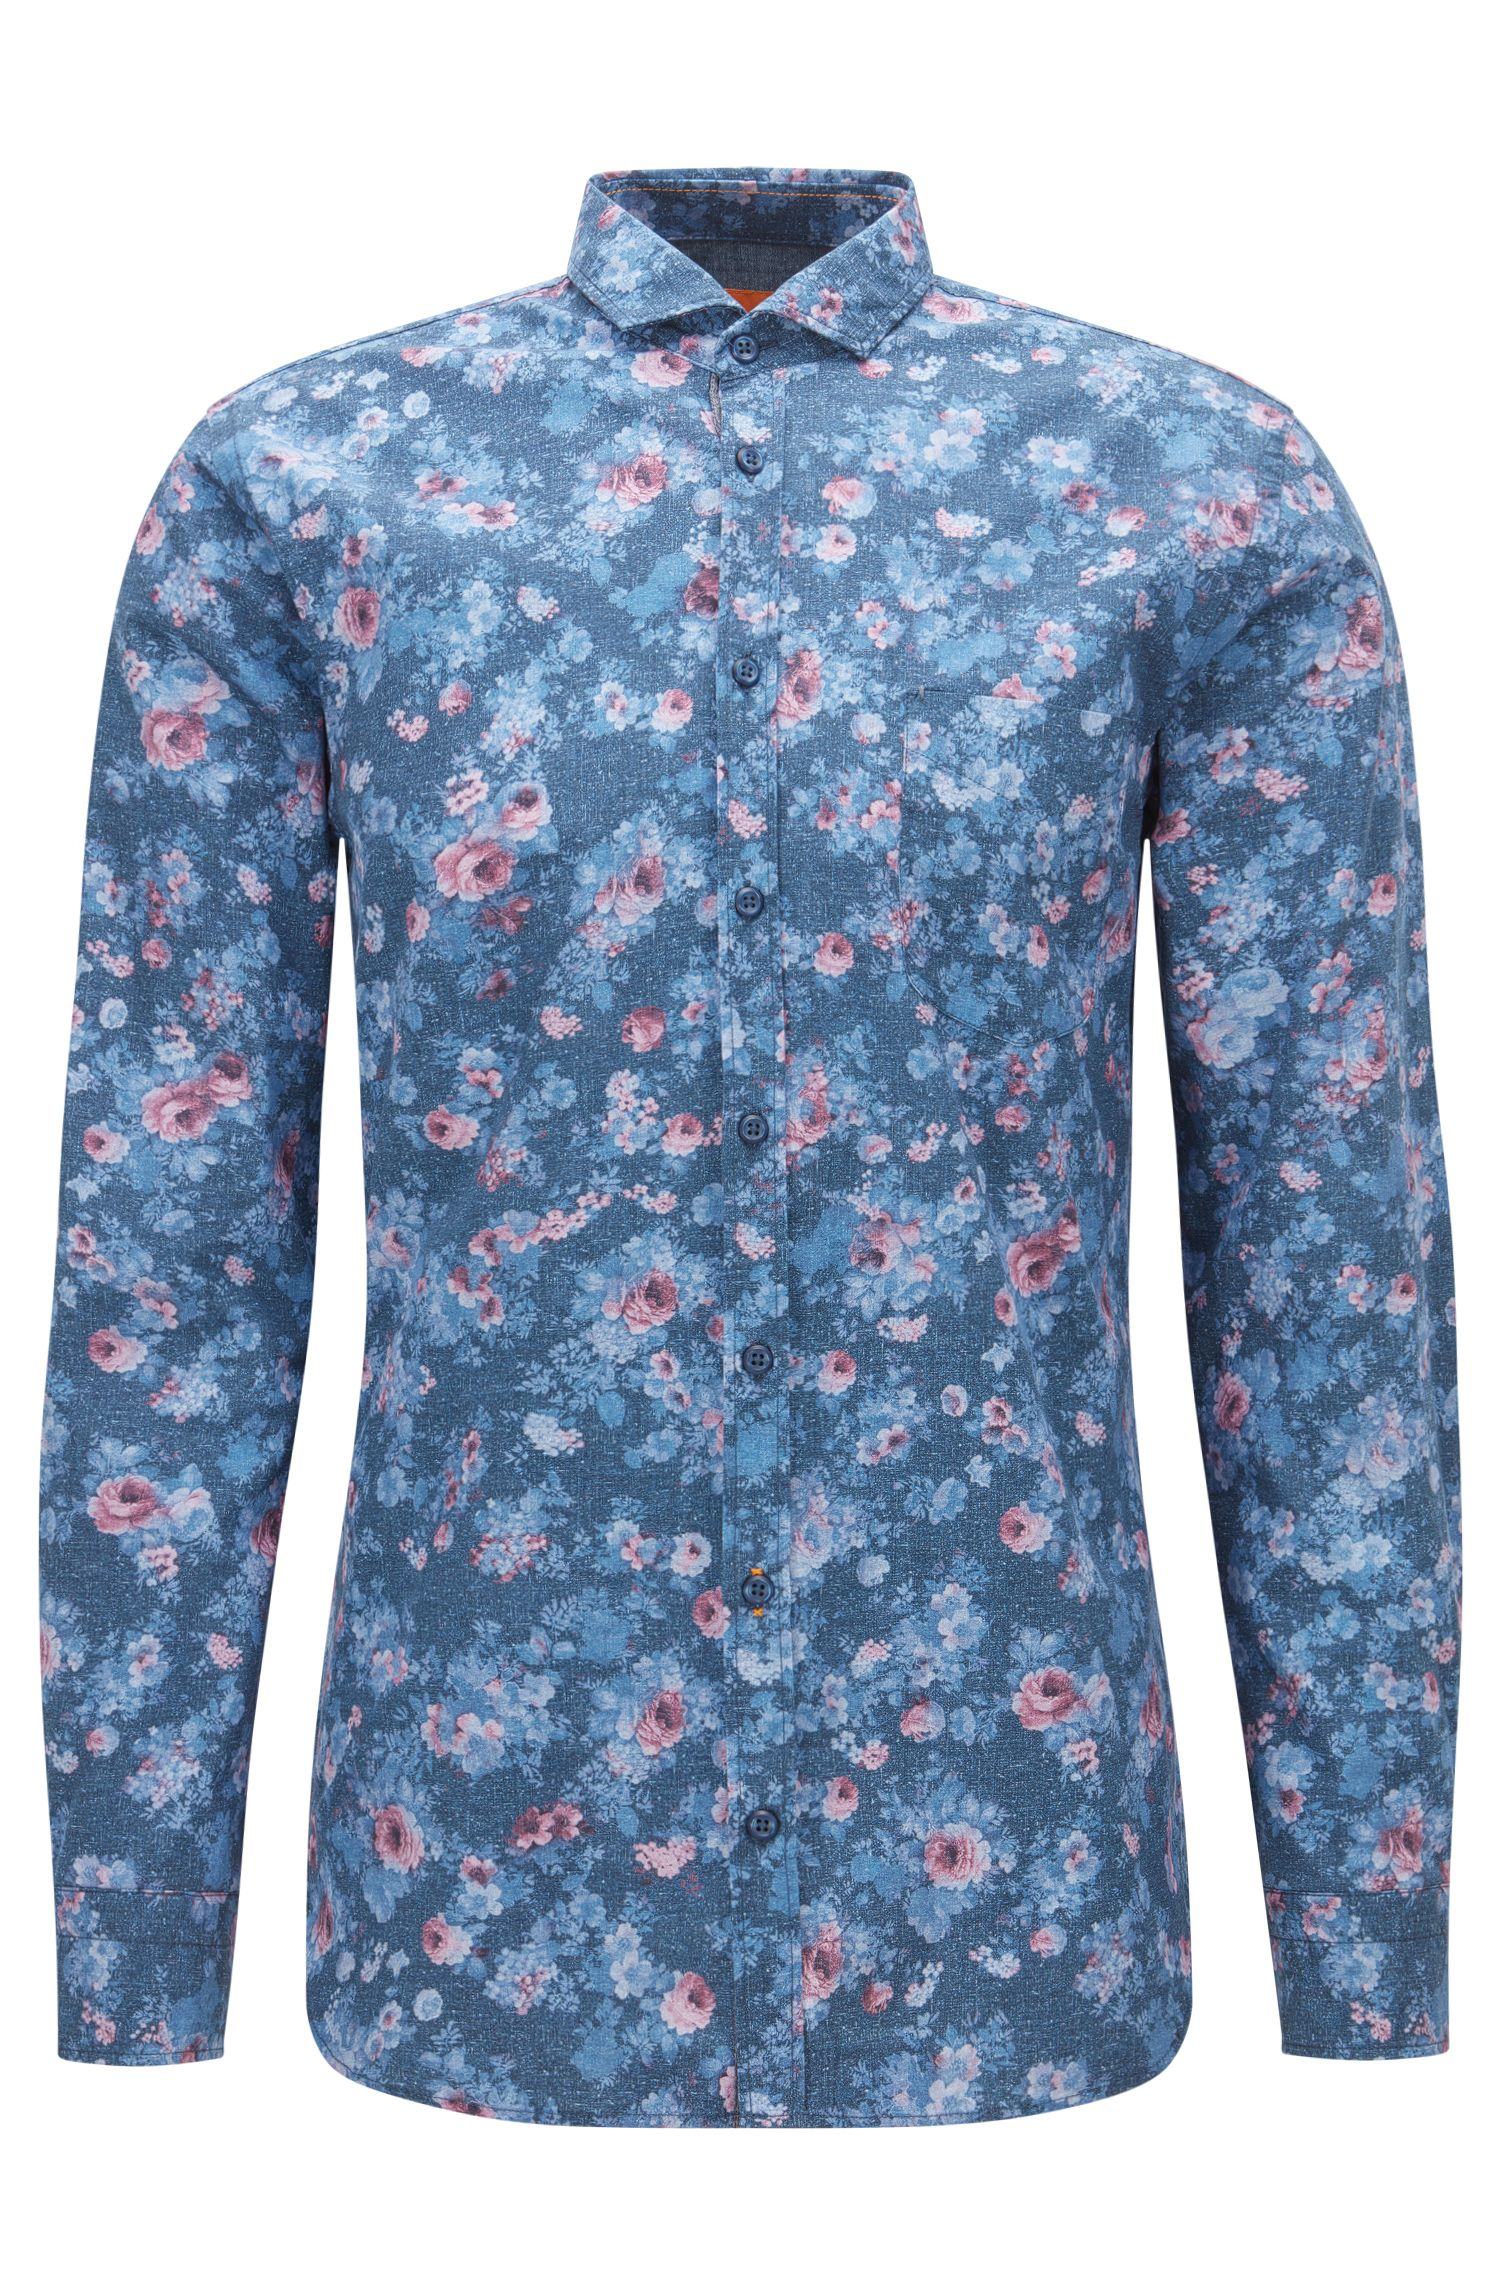 Floral Cotton Button Down Shirt, Slim Fit | Cattitude, Dark Blue